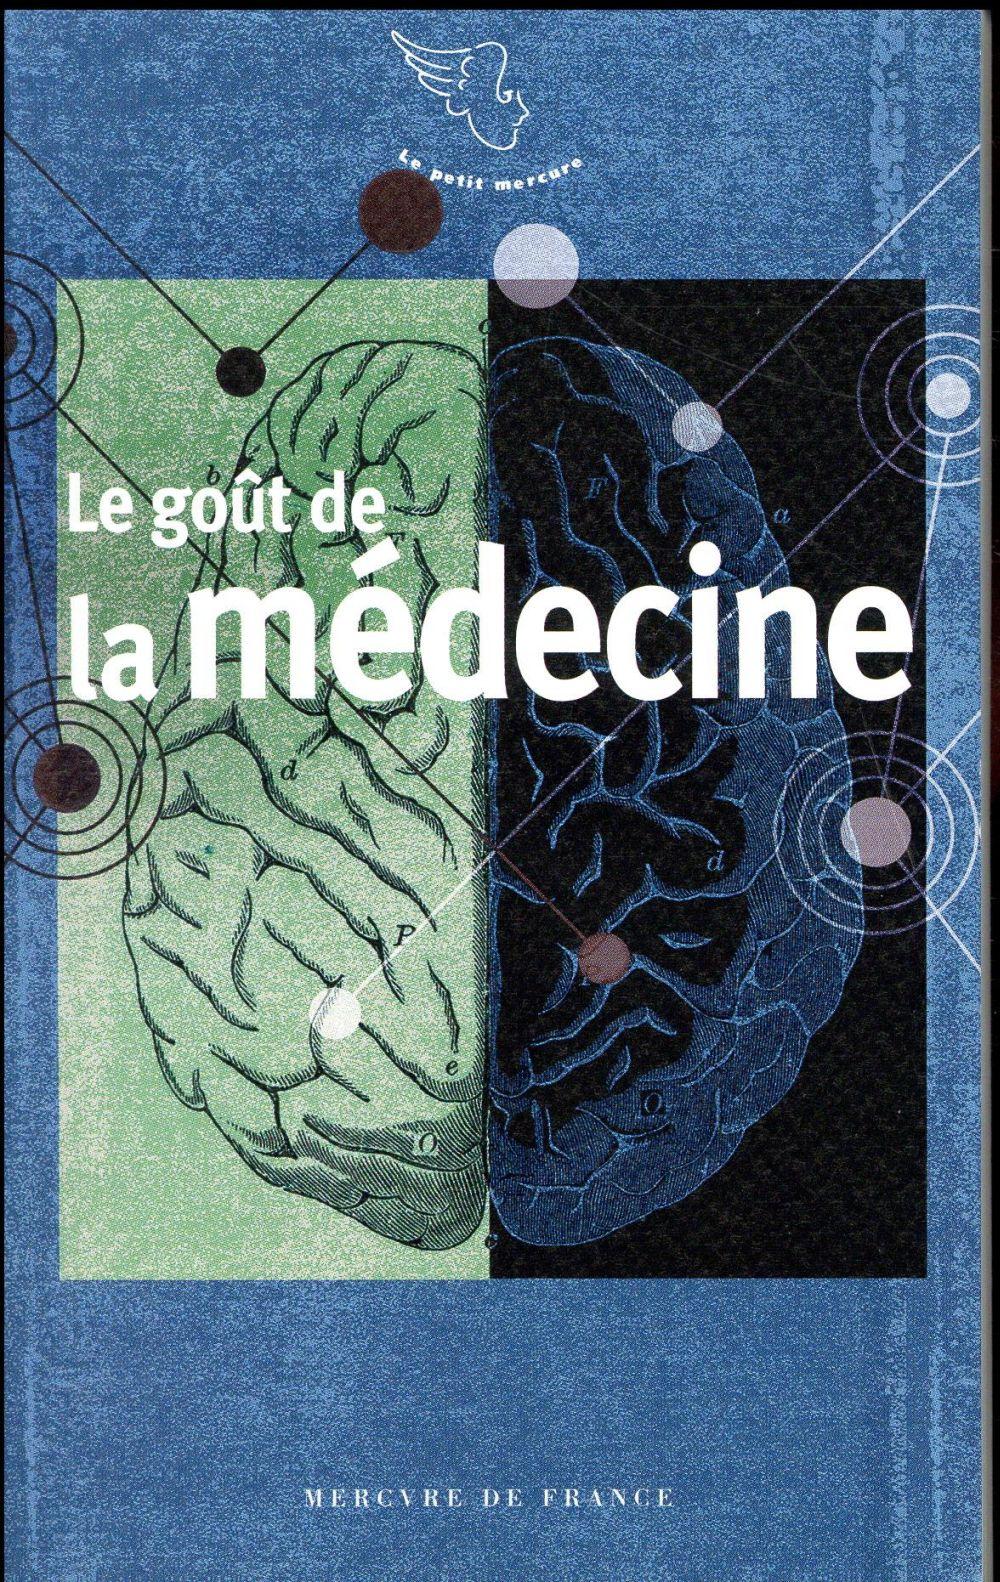 Le goût de la médecine